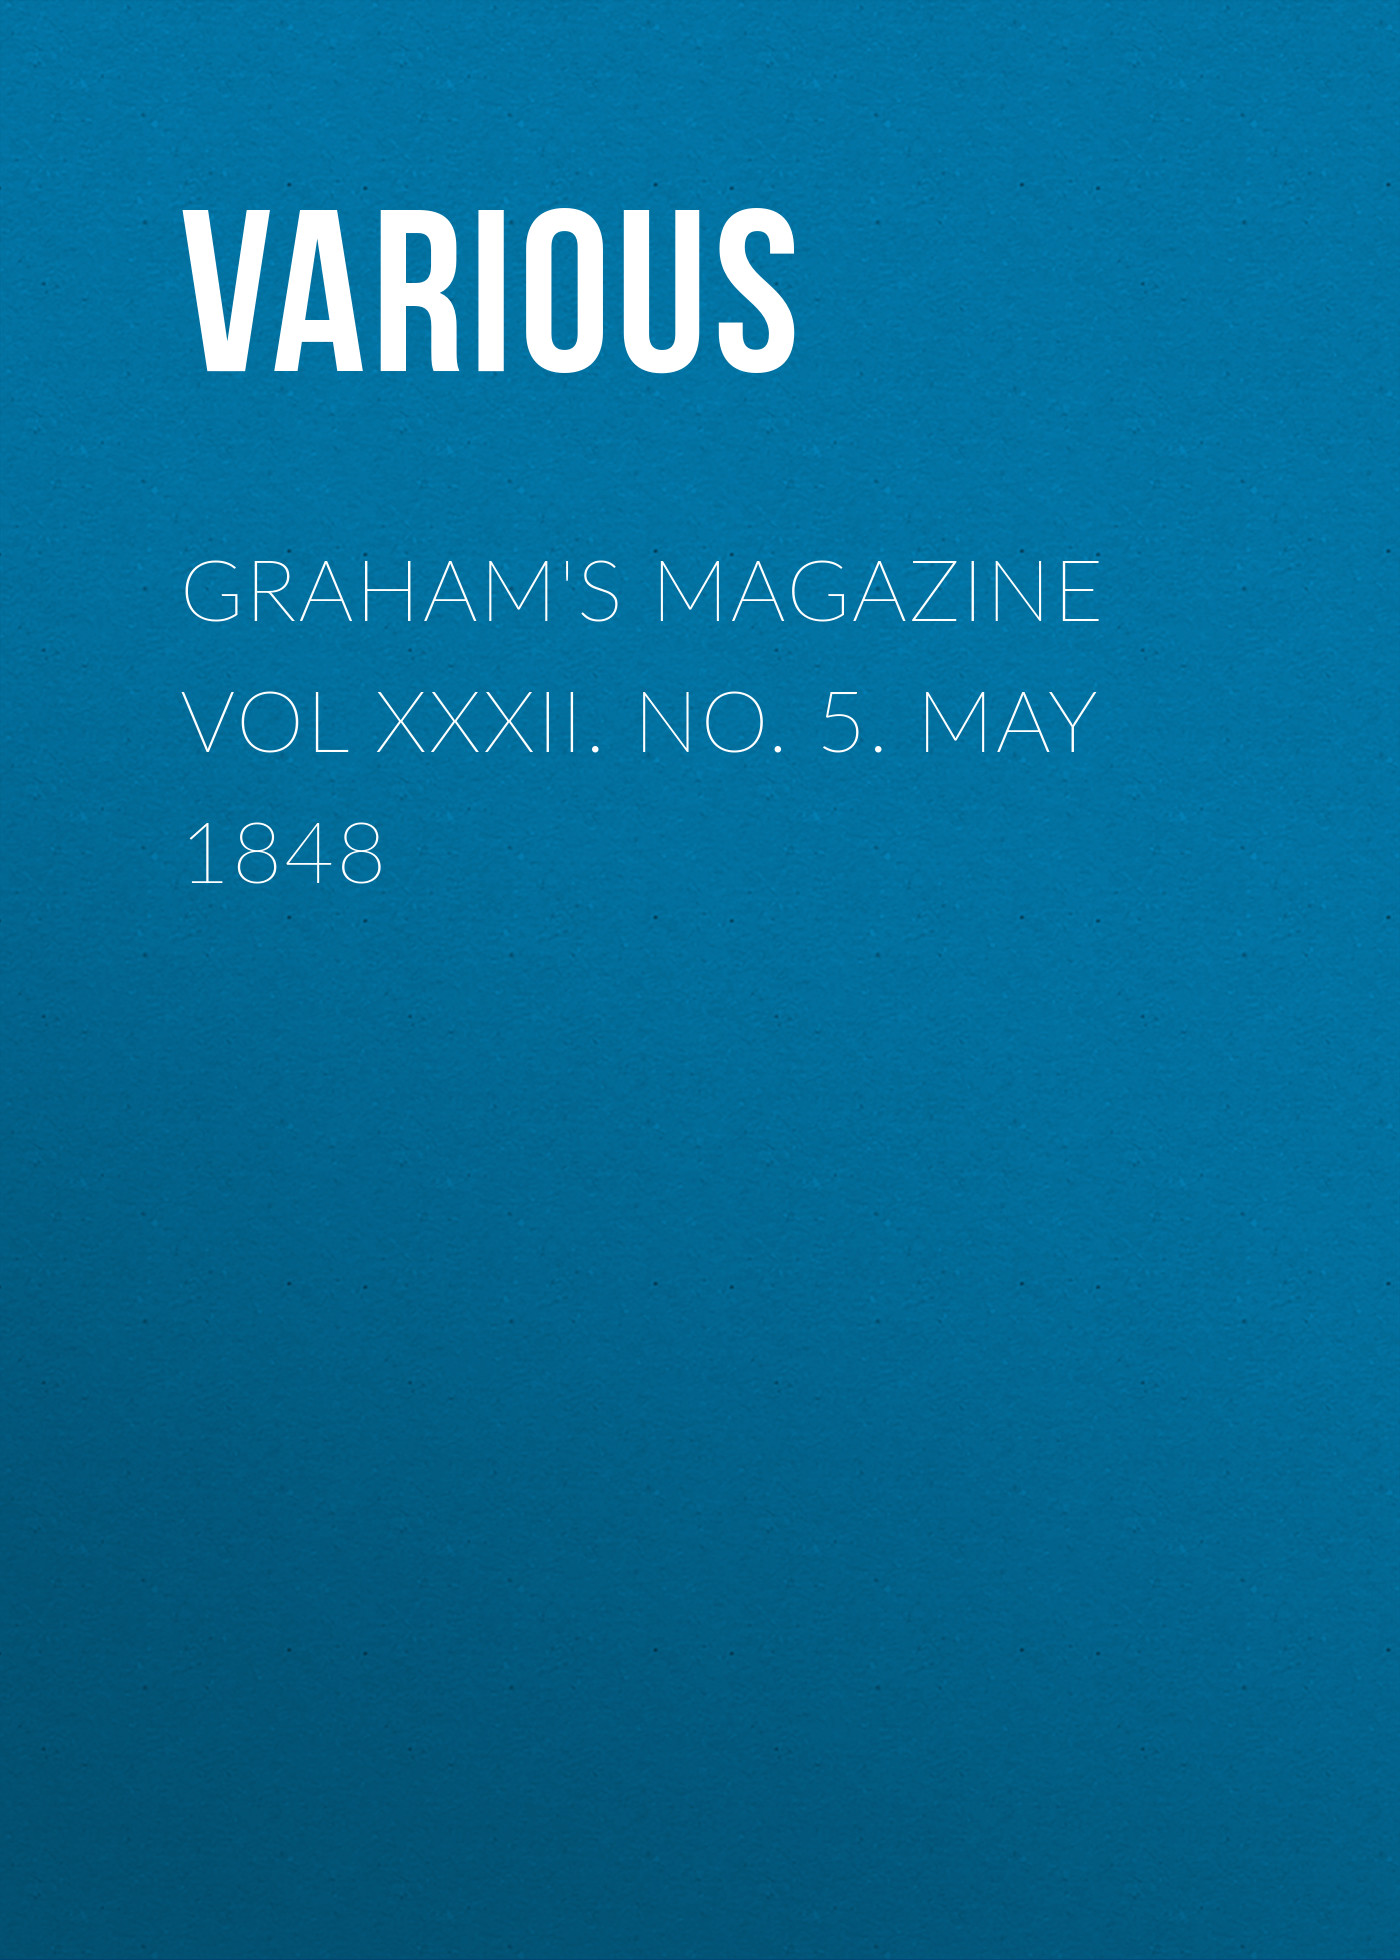 Various Graham's Magazine Vol XXXII. No. 5. May 1848 powerhouse magazine 5